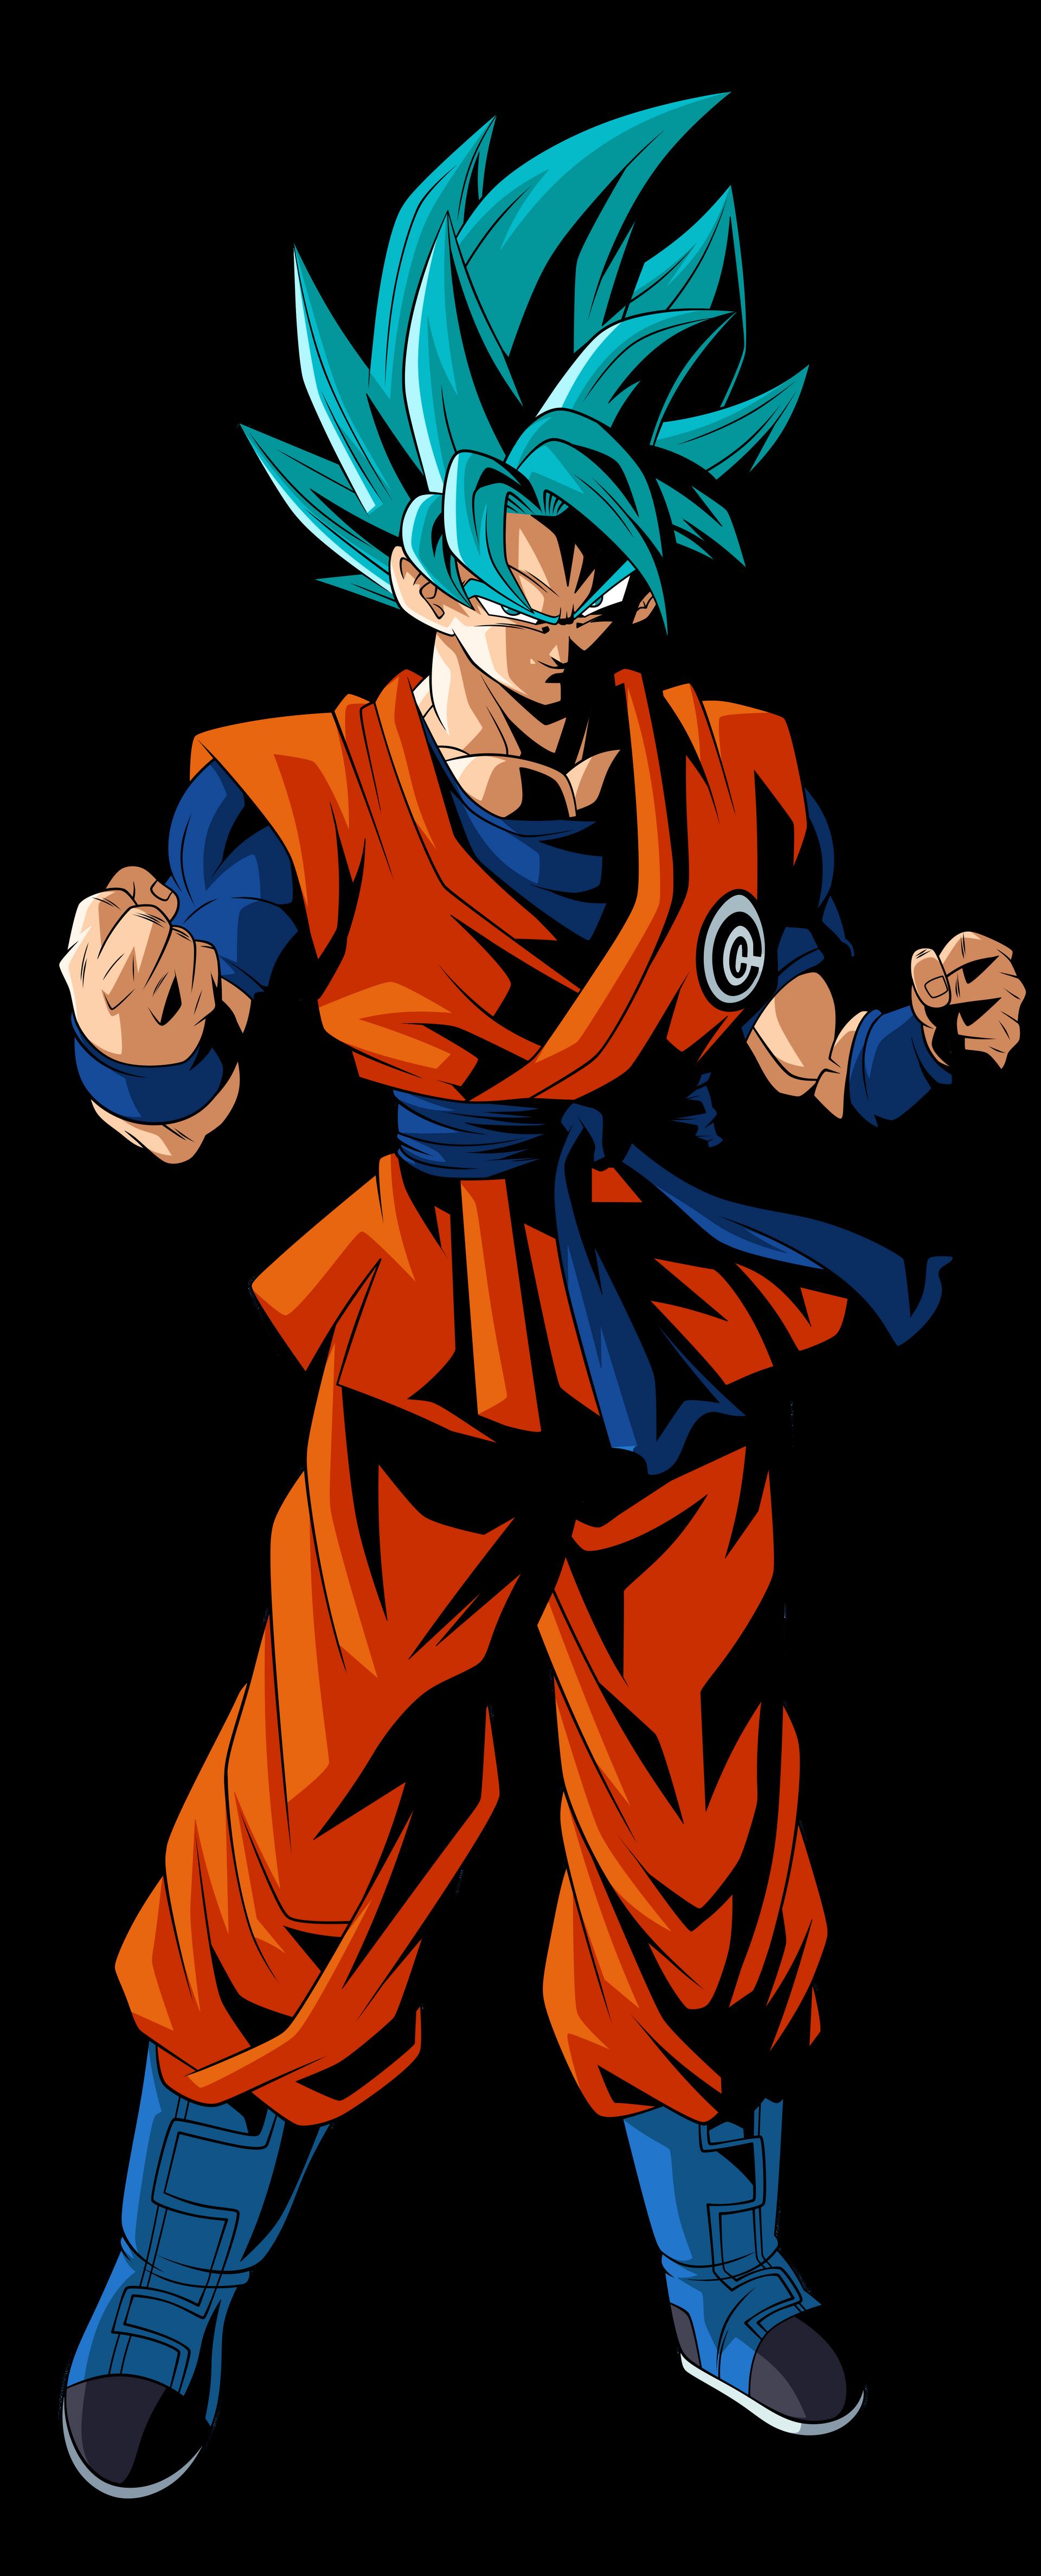 Goku Super Saiyajin Blue Render 4 By Ssjrose890 On Deviantart Dragon Ball Super Manga Anime Dragon Ball Super Dragon Ball Super Goku